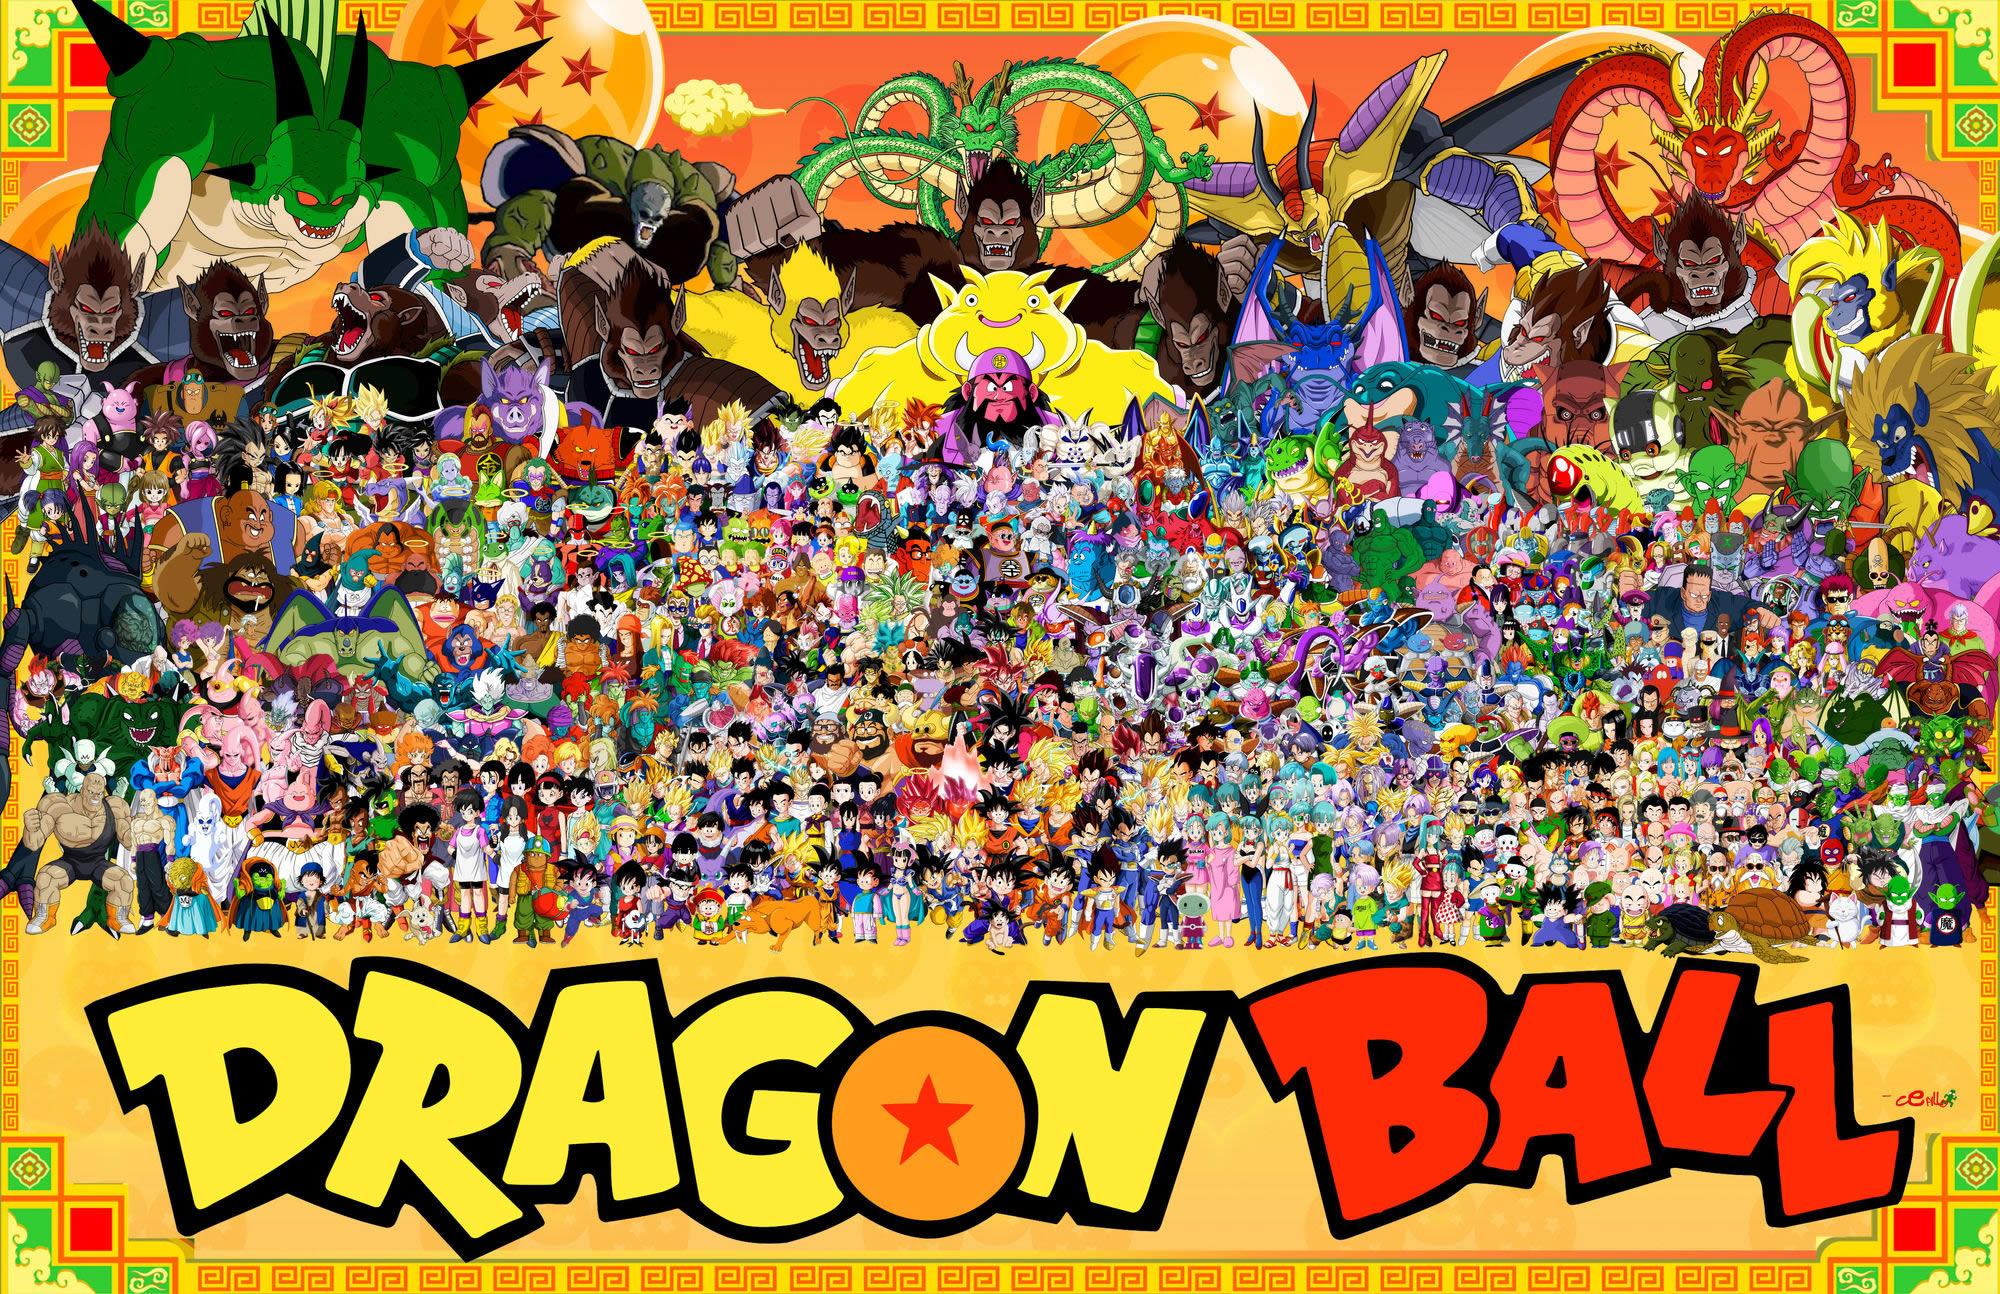 personajes-dragonball